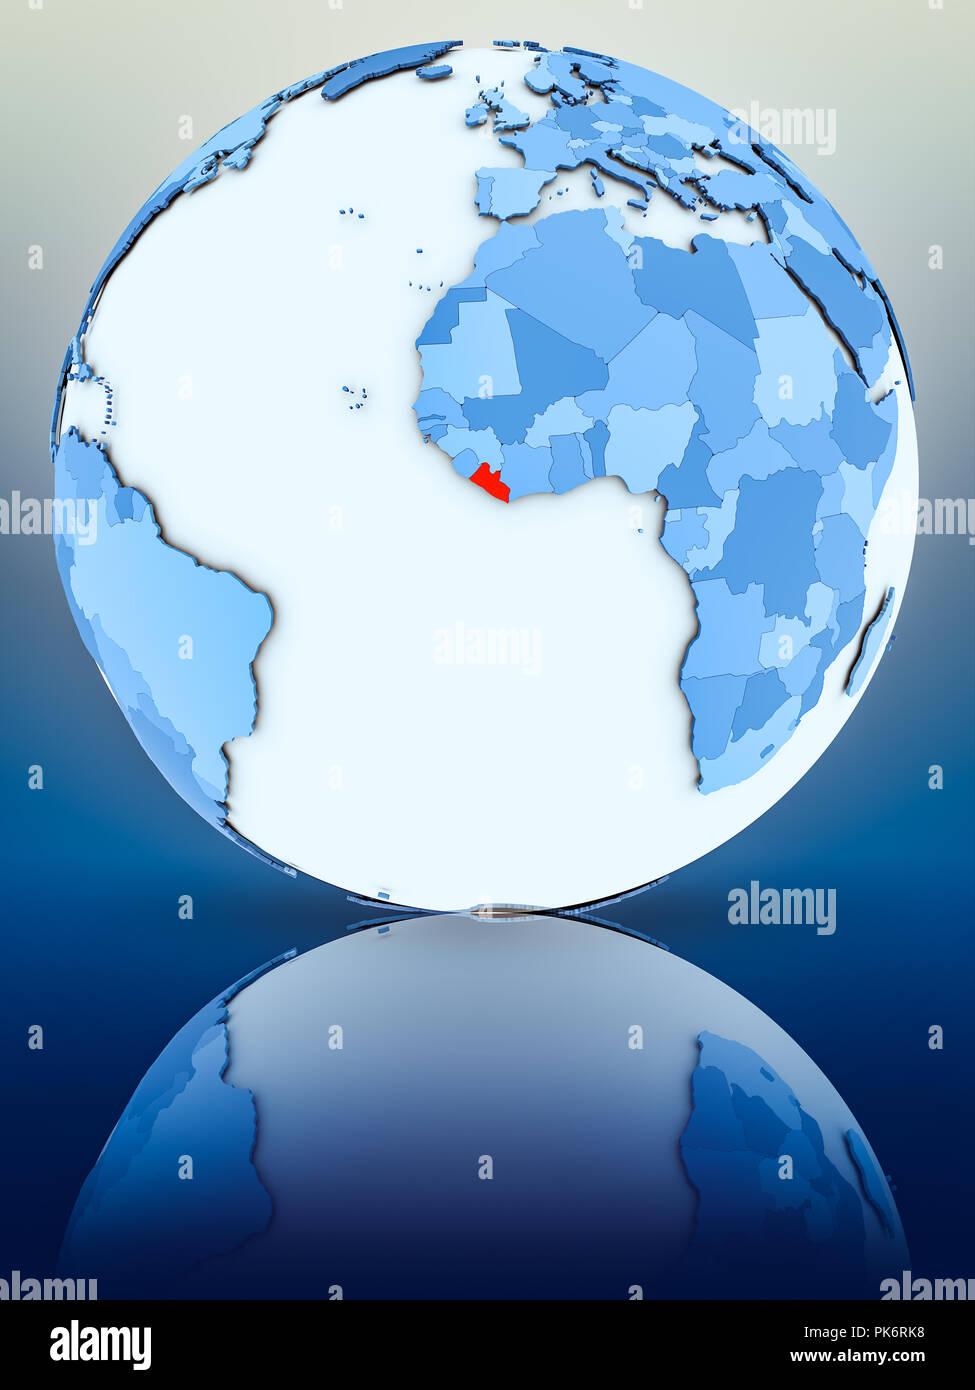 Liberia on blue globe on reflective surface. 3D illustration. - Stock Image